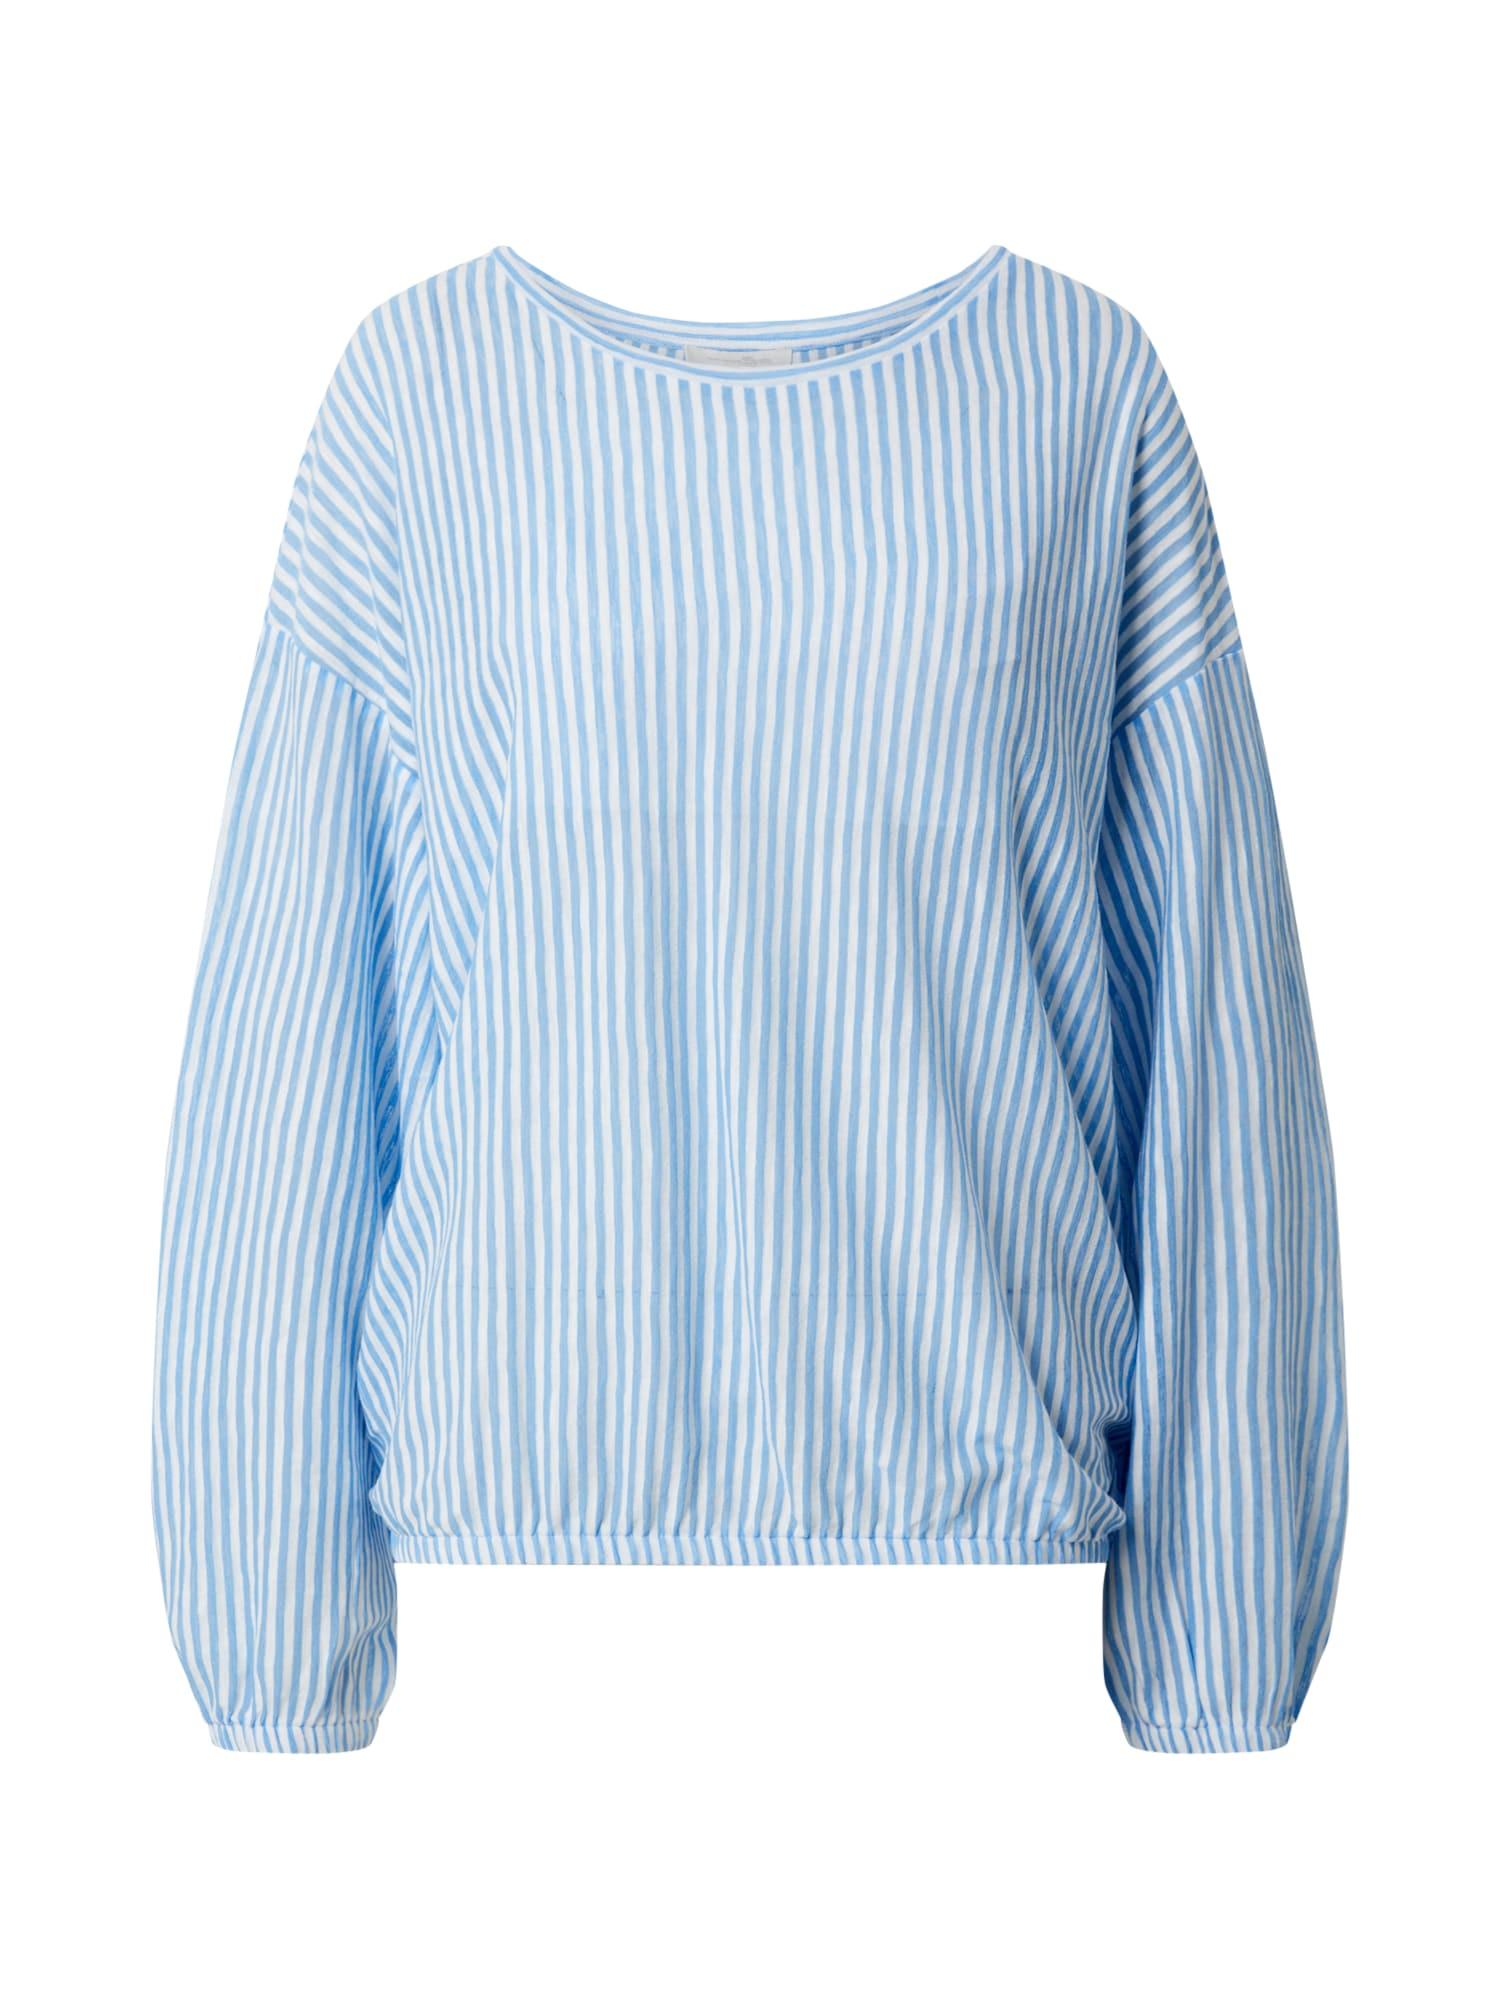 TOM TAILOR DENIM Tričko  modré / námornícka modrá